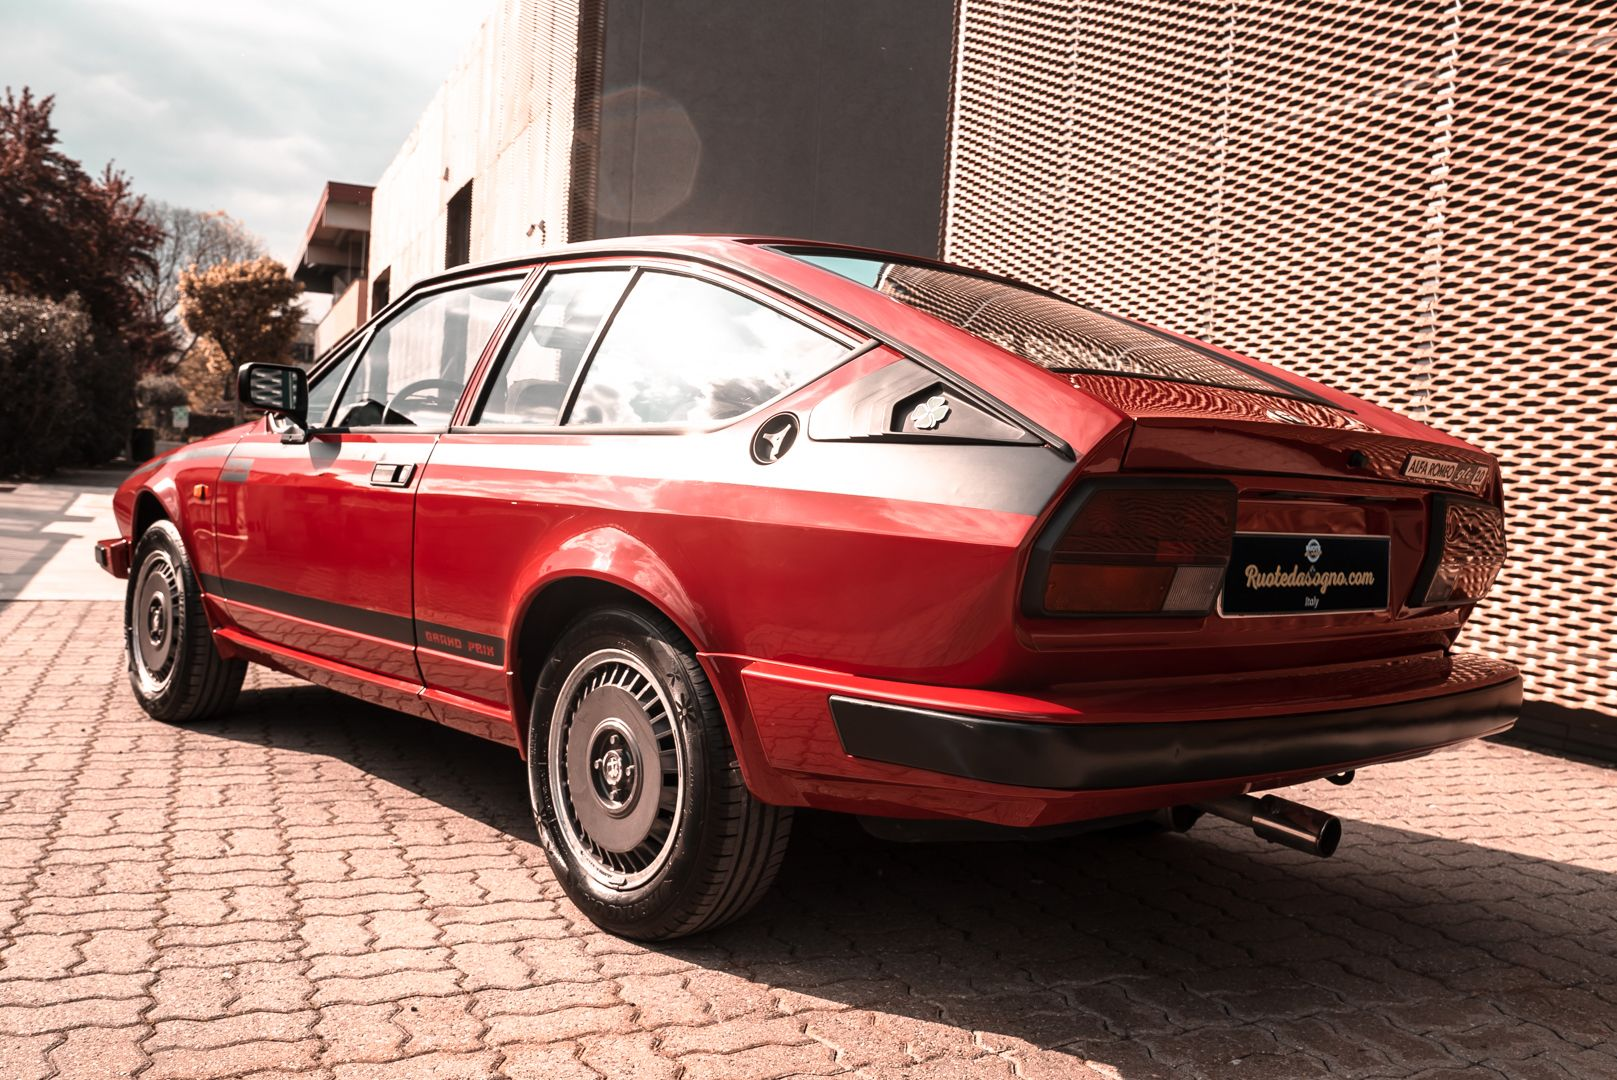 1981 Alfa Romeo Alfetta GTV Gran Prix n.128 68559